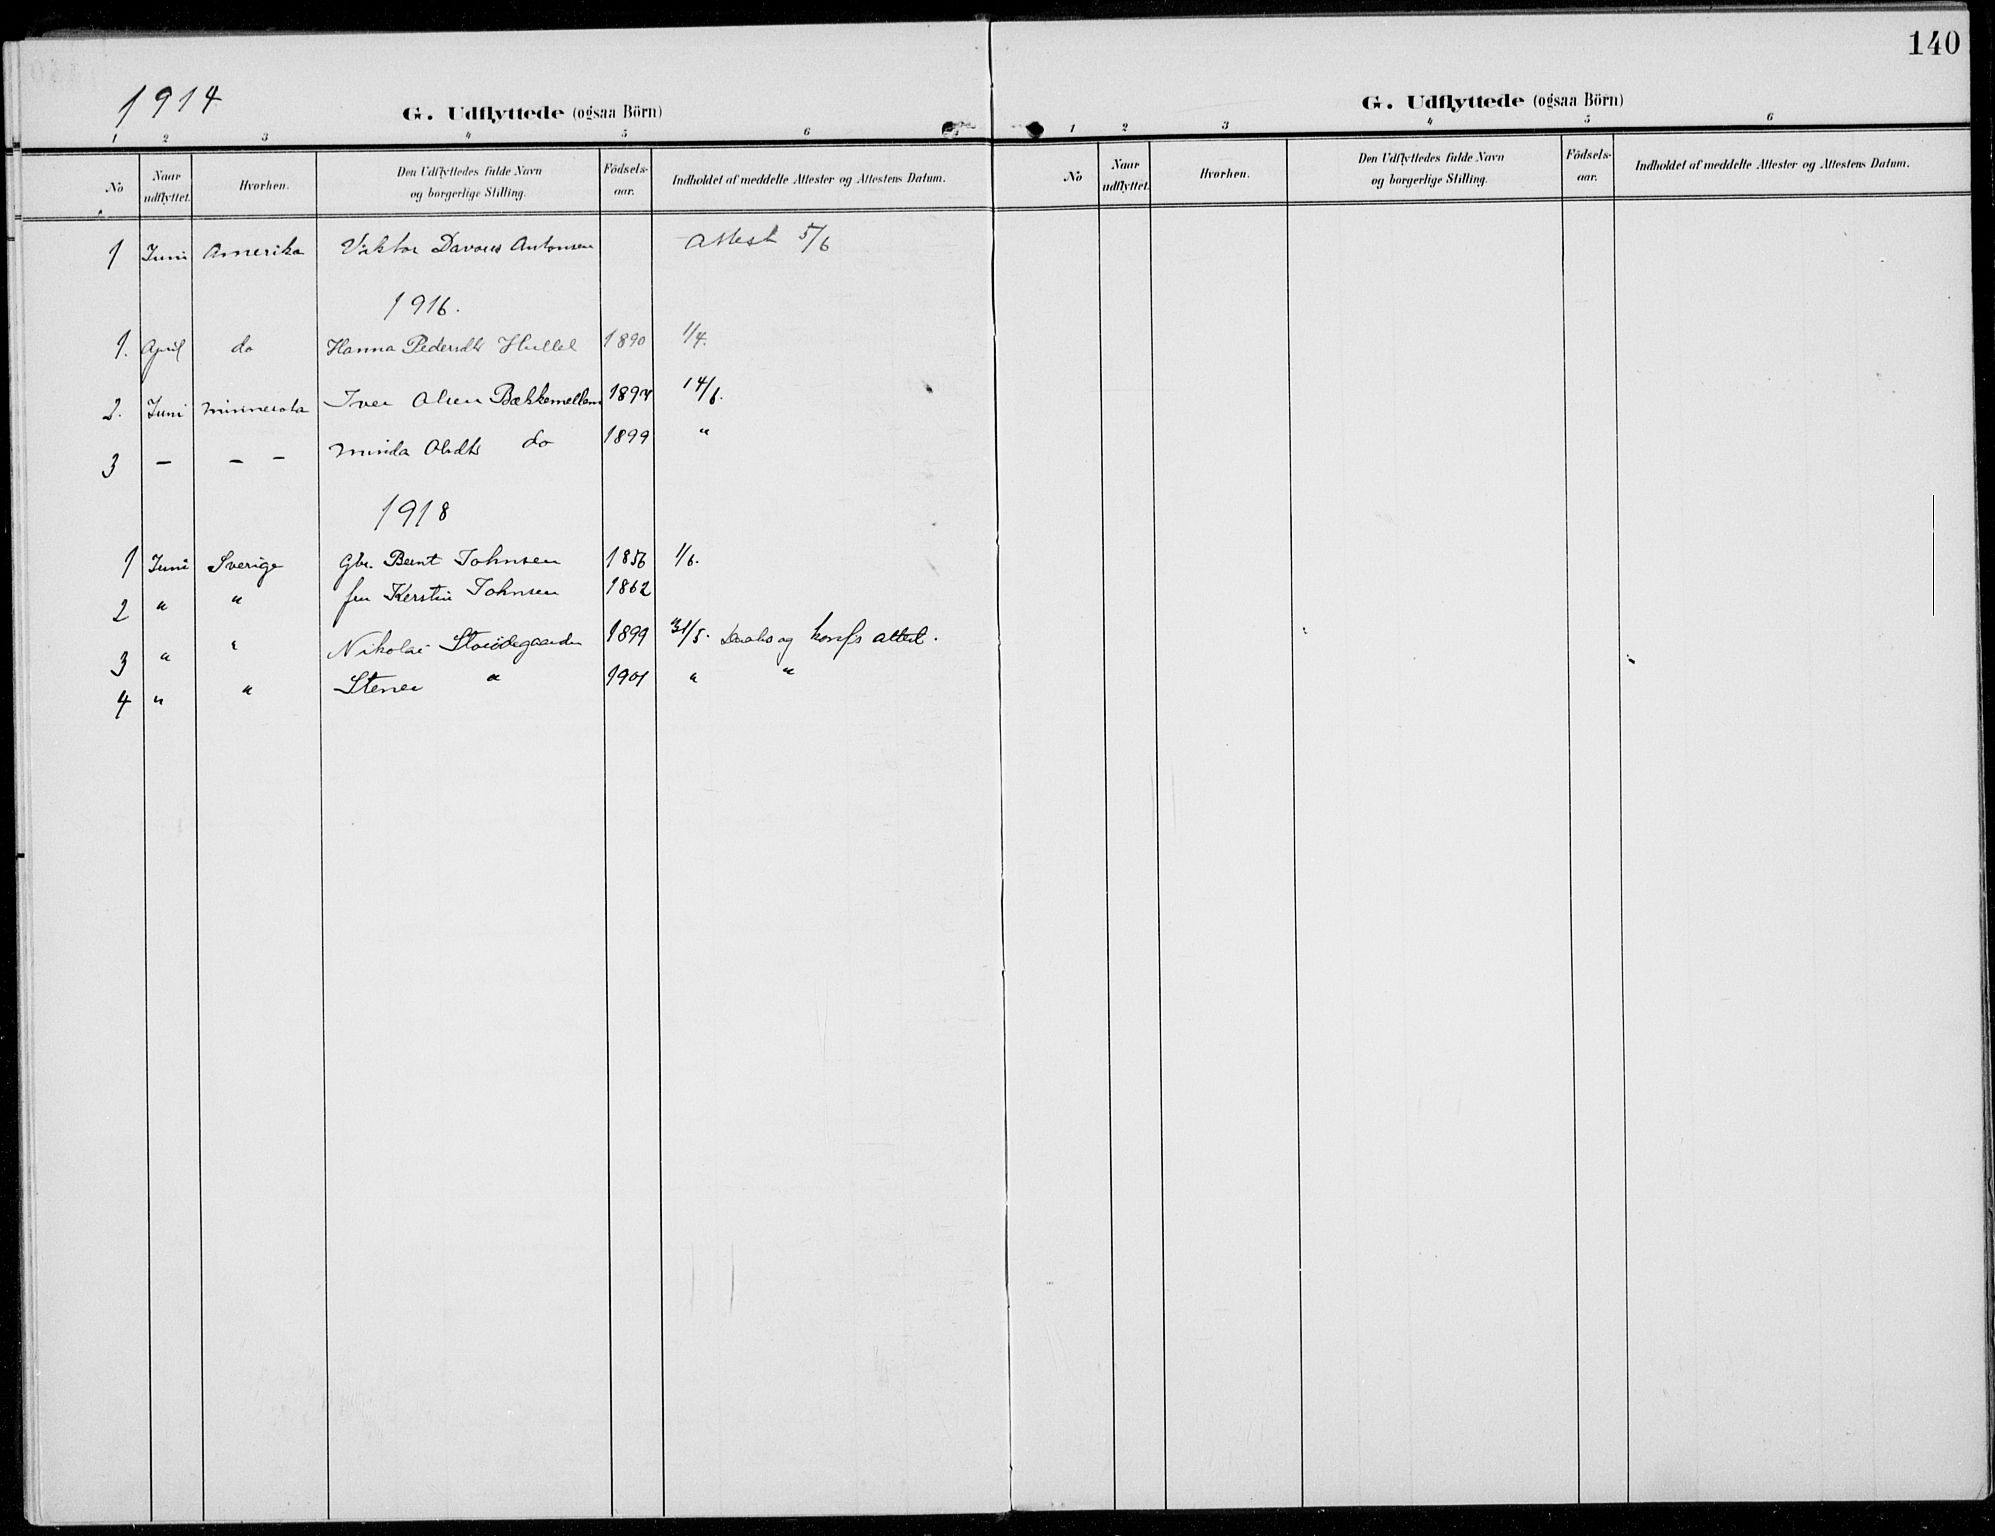 SAH, Sel prestekontor, Ministerialbok nr. 1, 1905-1922, s. 140